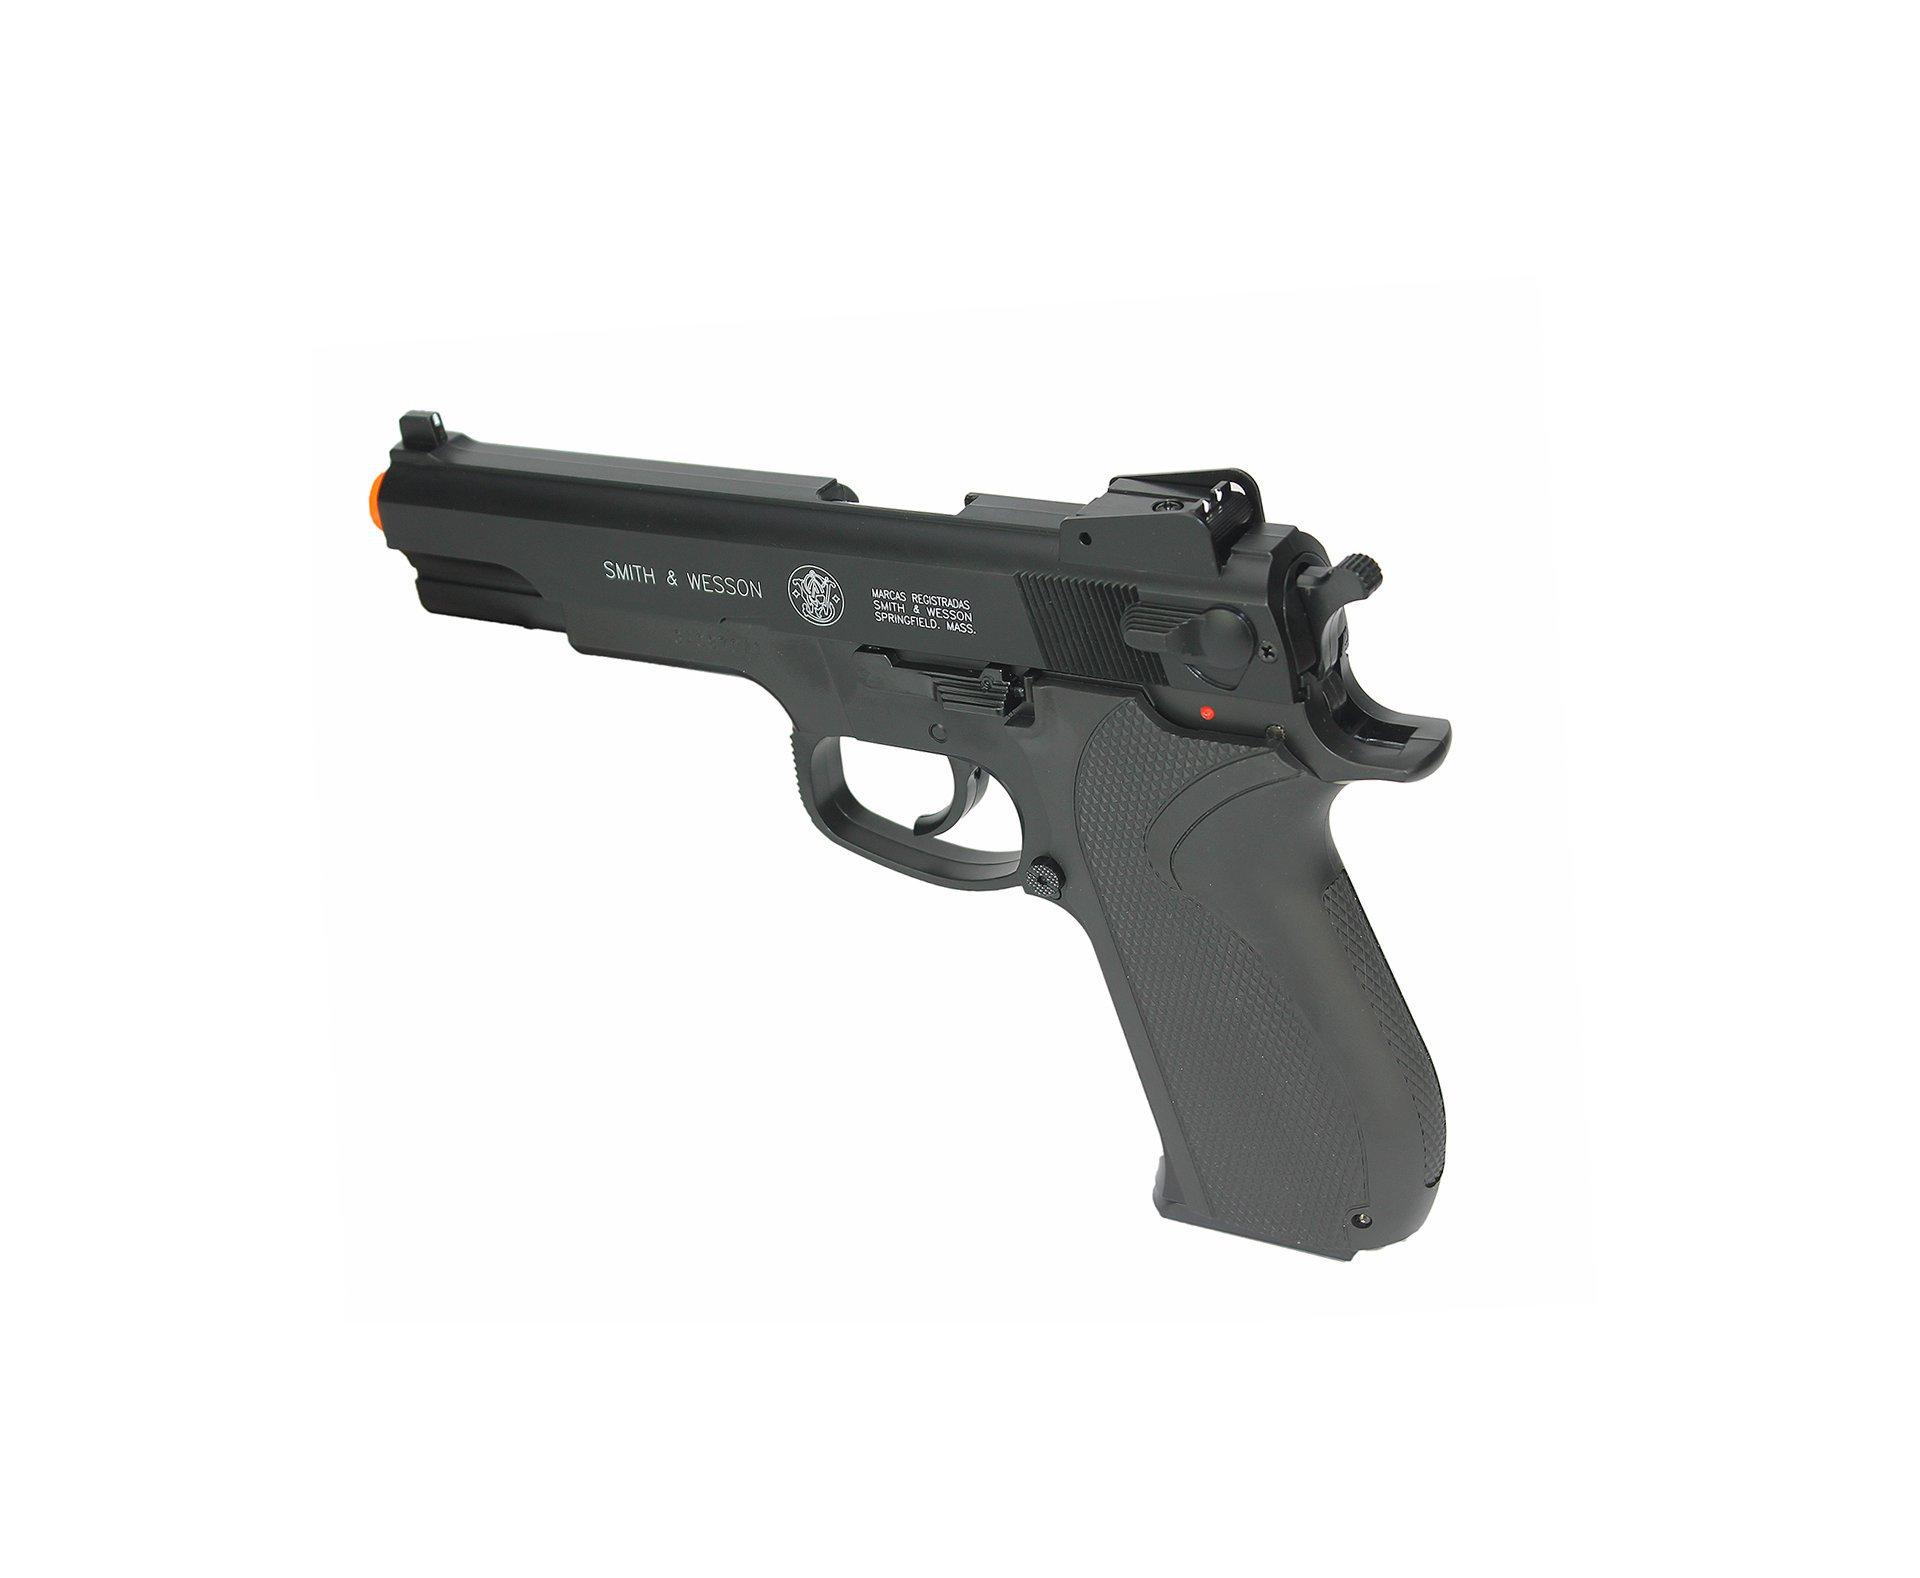 Pistola De Airsoft Smith & Wesson M4505 Slide Metal - Calibre 6,0 Mm - Smith & Wesson